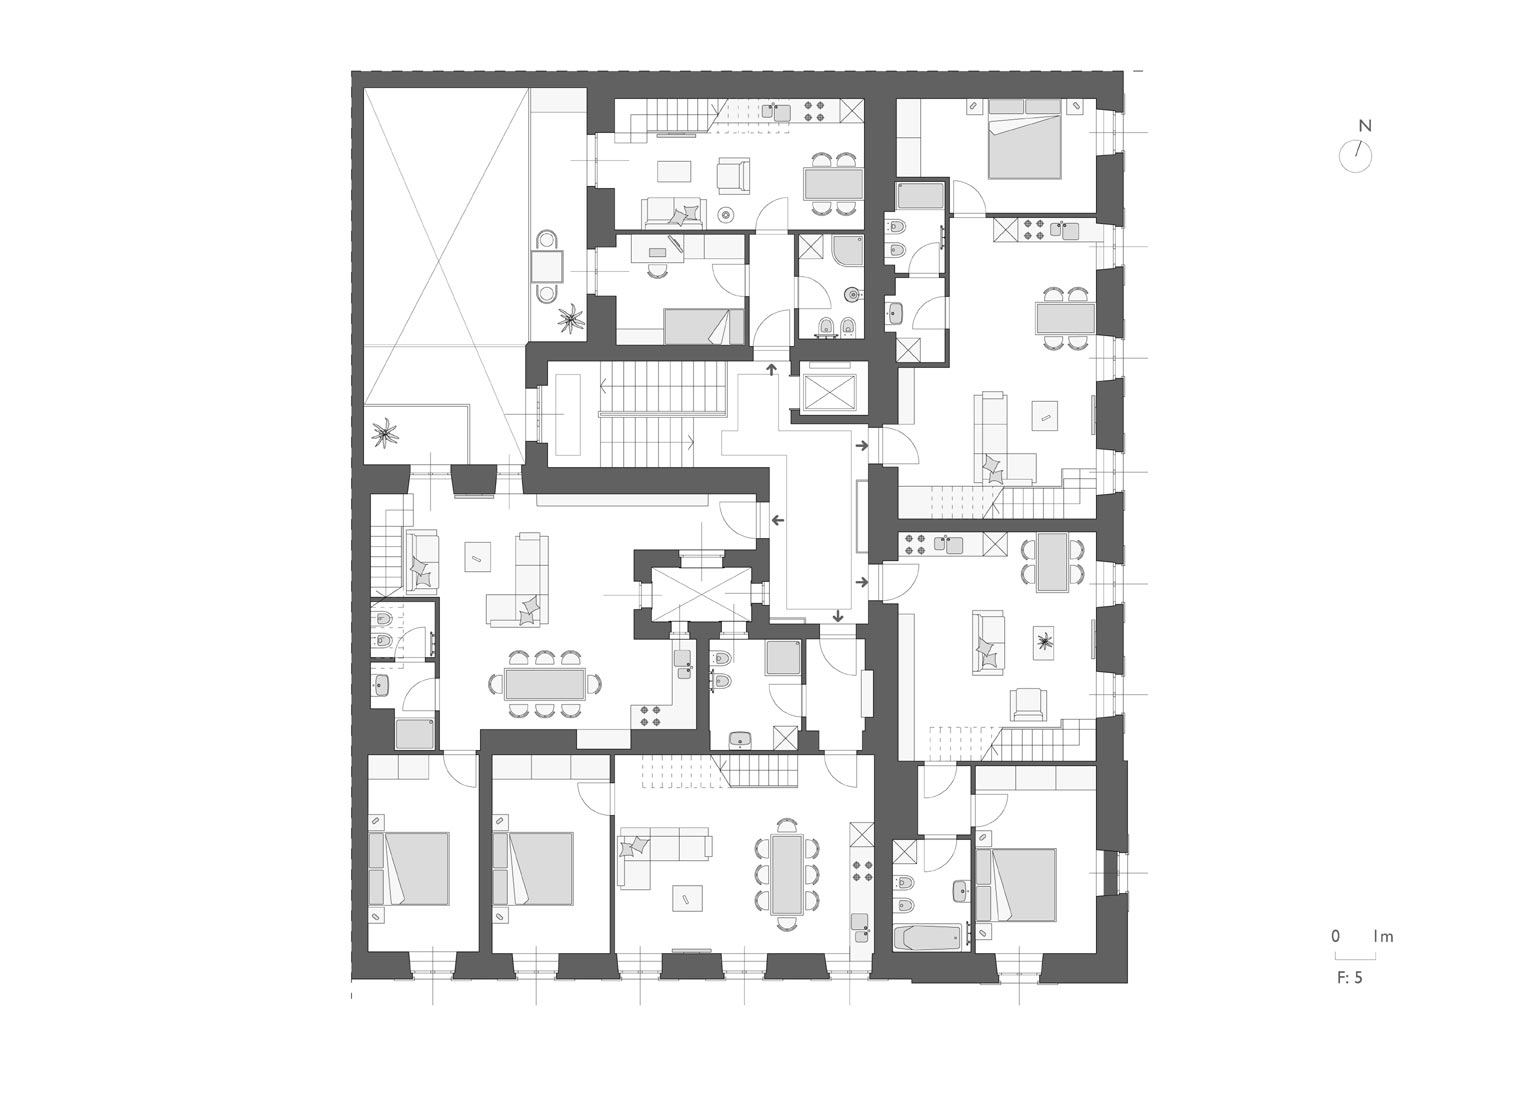 vk-architetti_belvedere_f5